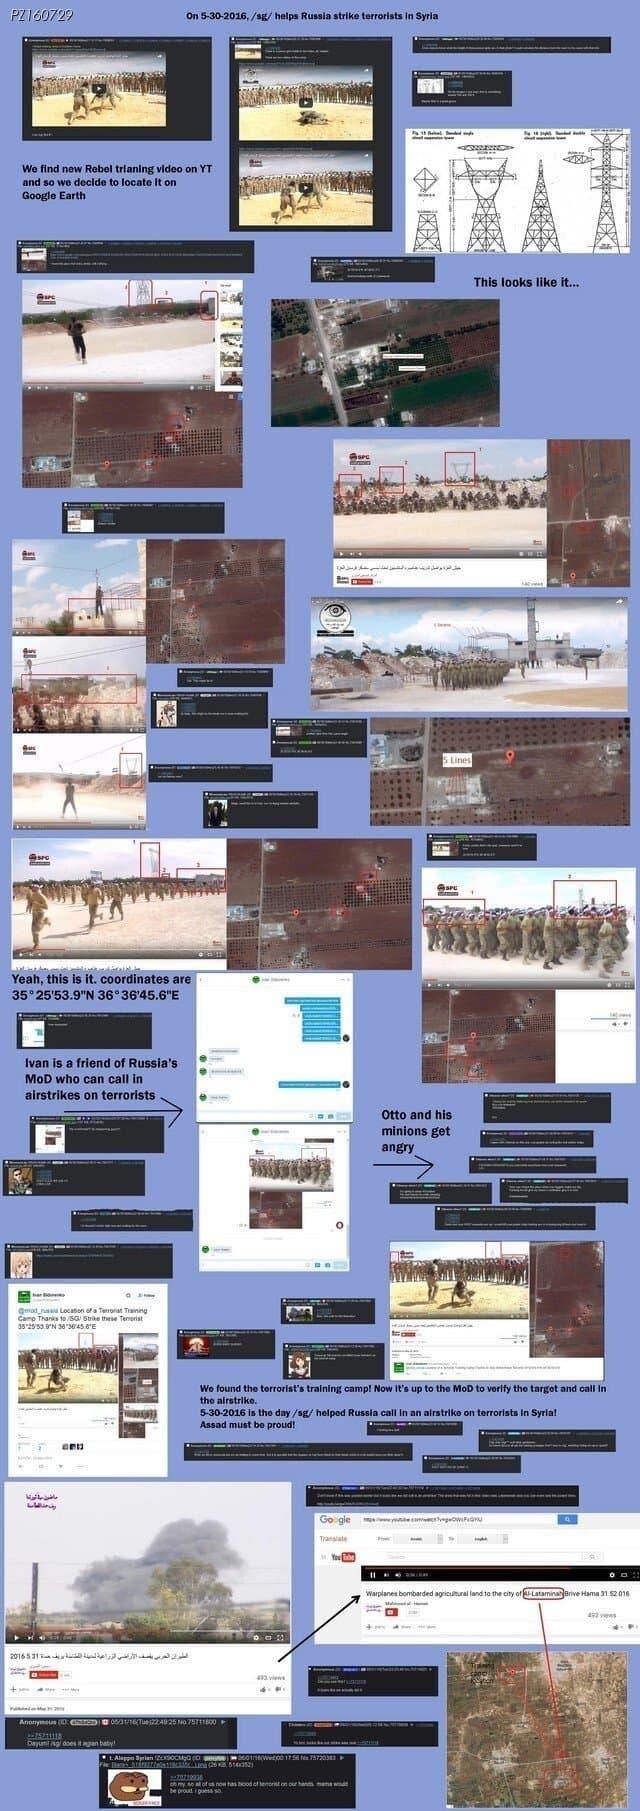 viewimage.php?id=3eb4de21e9d73ab360b8dab04785736f&no=24b0d769e1d32ca73deb87fa11d02831de04ca5aee4f7f339edb1c2bda437836e1a19a84fe073db9aaee47b14ce183601e3f899e6e649e5e9025bc4cc042780d0781597e40c5b57e7b493b5d23138414a180e14ee0f2458610211b711c83c1b12d9750459365a59ca14e47eba83fb660